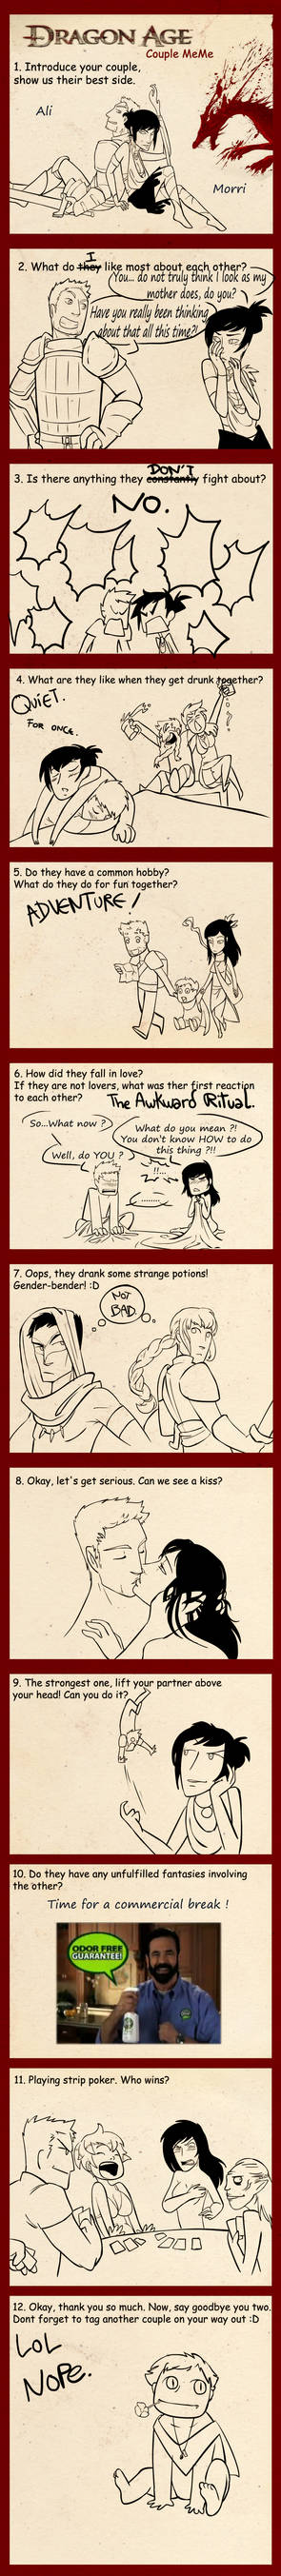 DragonAge couple meme - Morristair